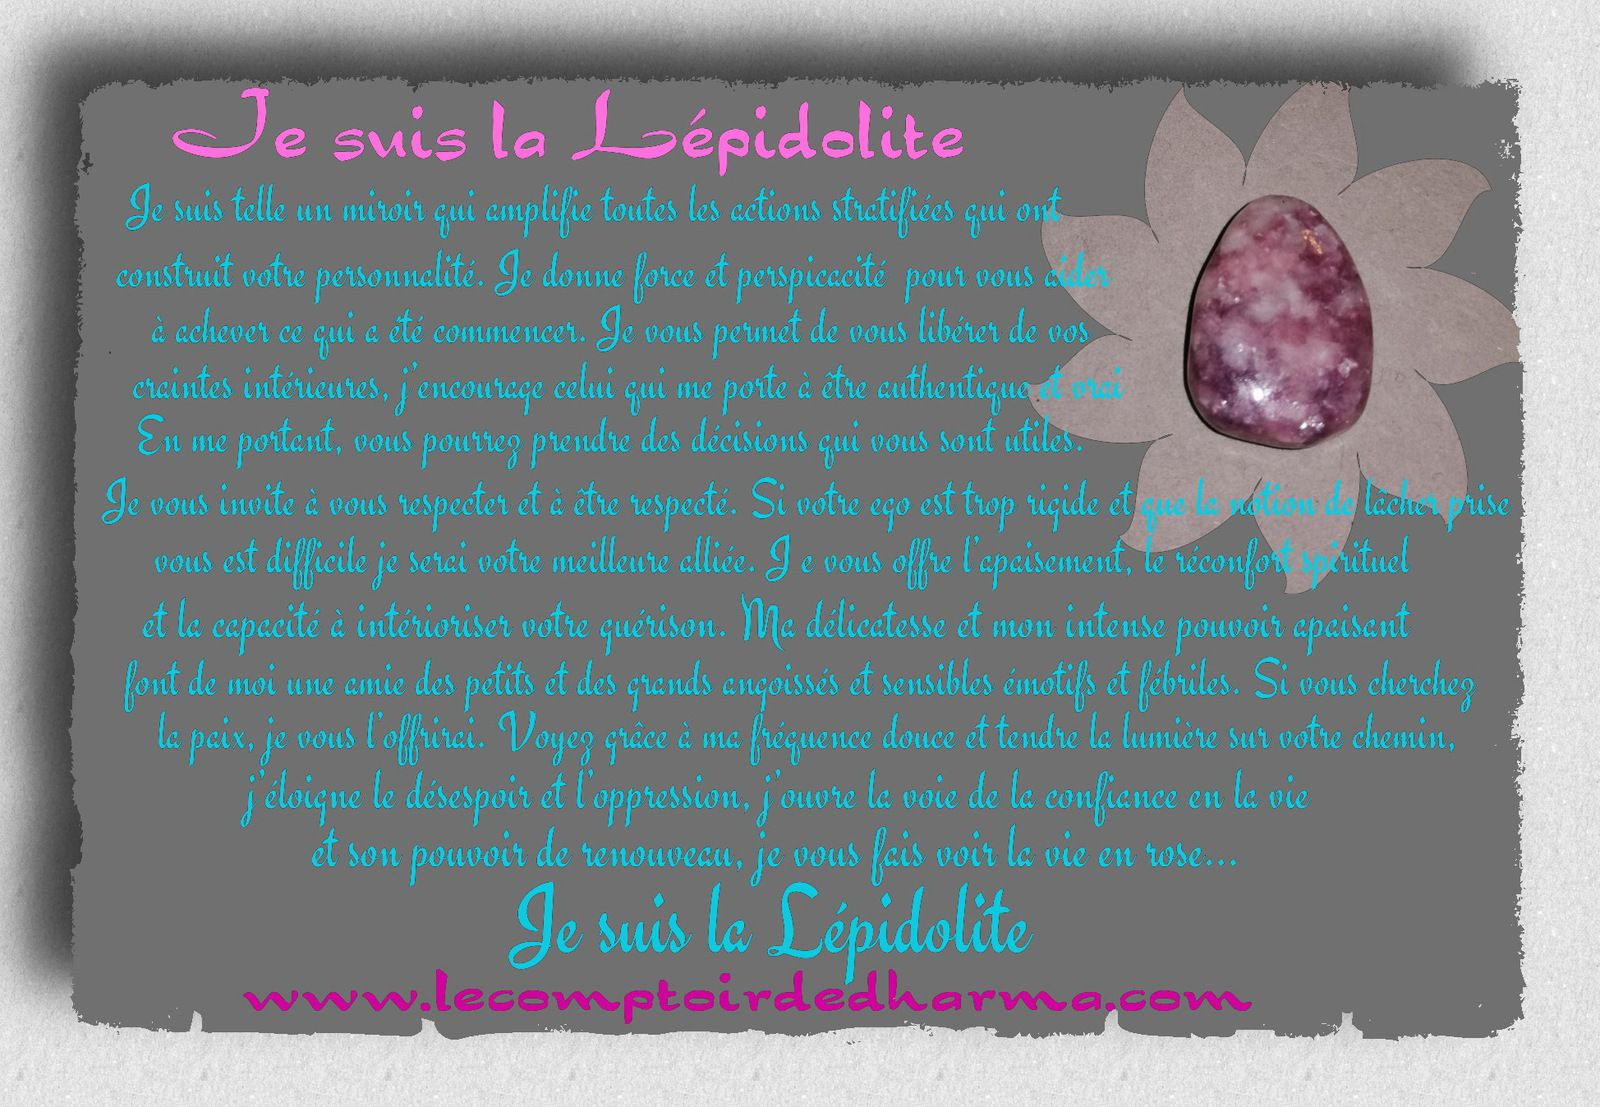 la Lépidolite